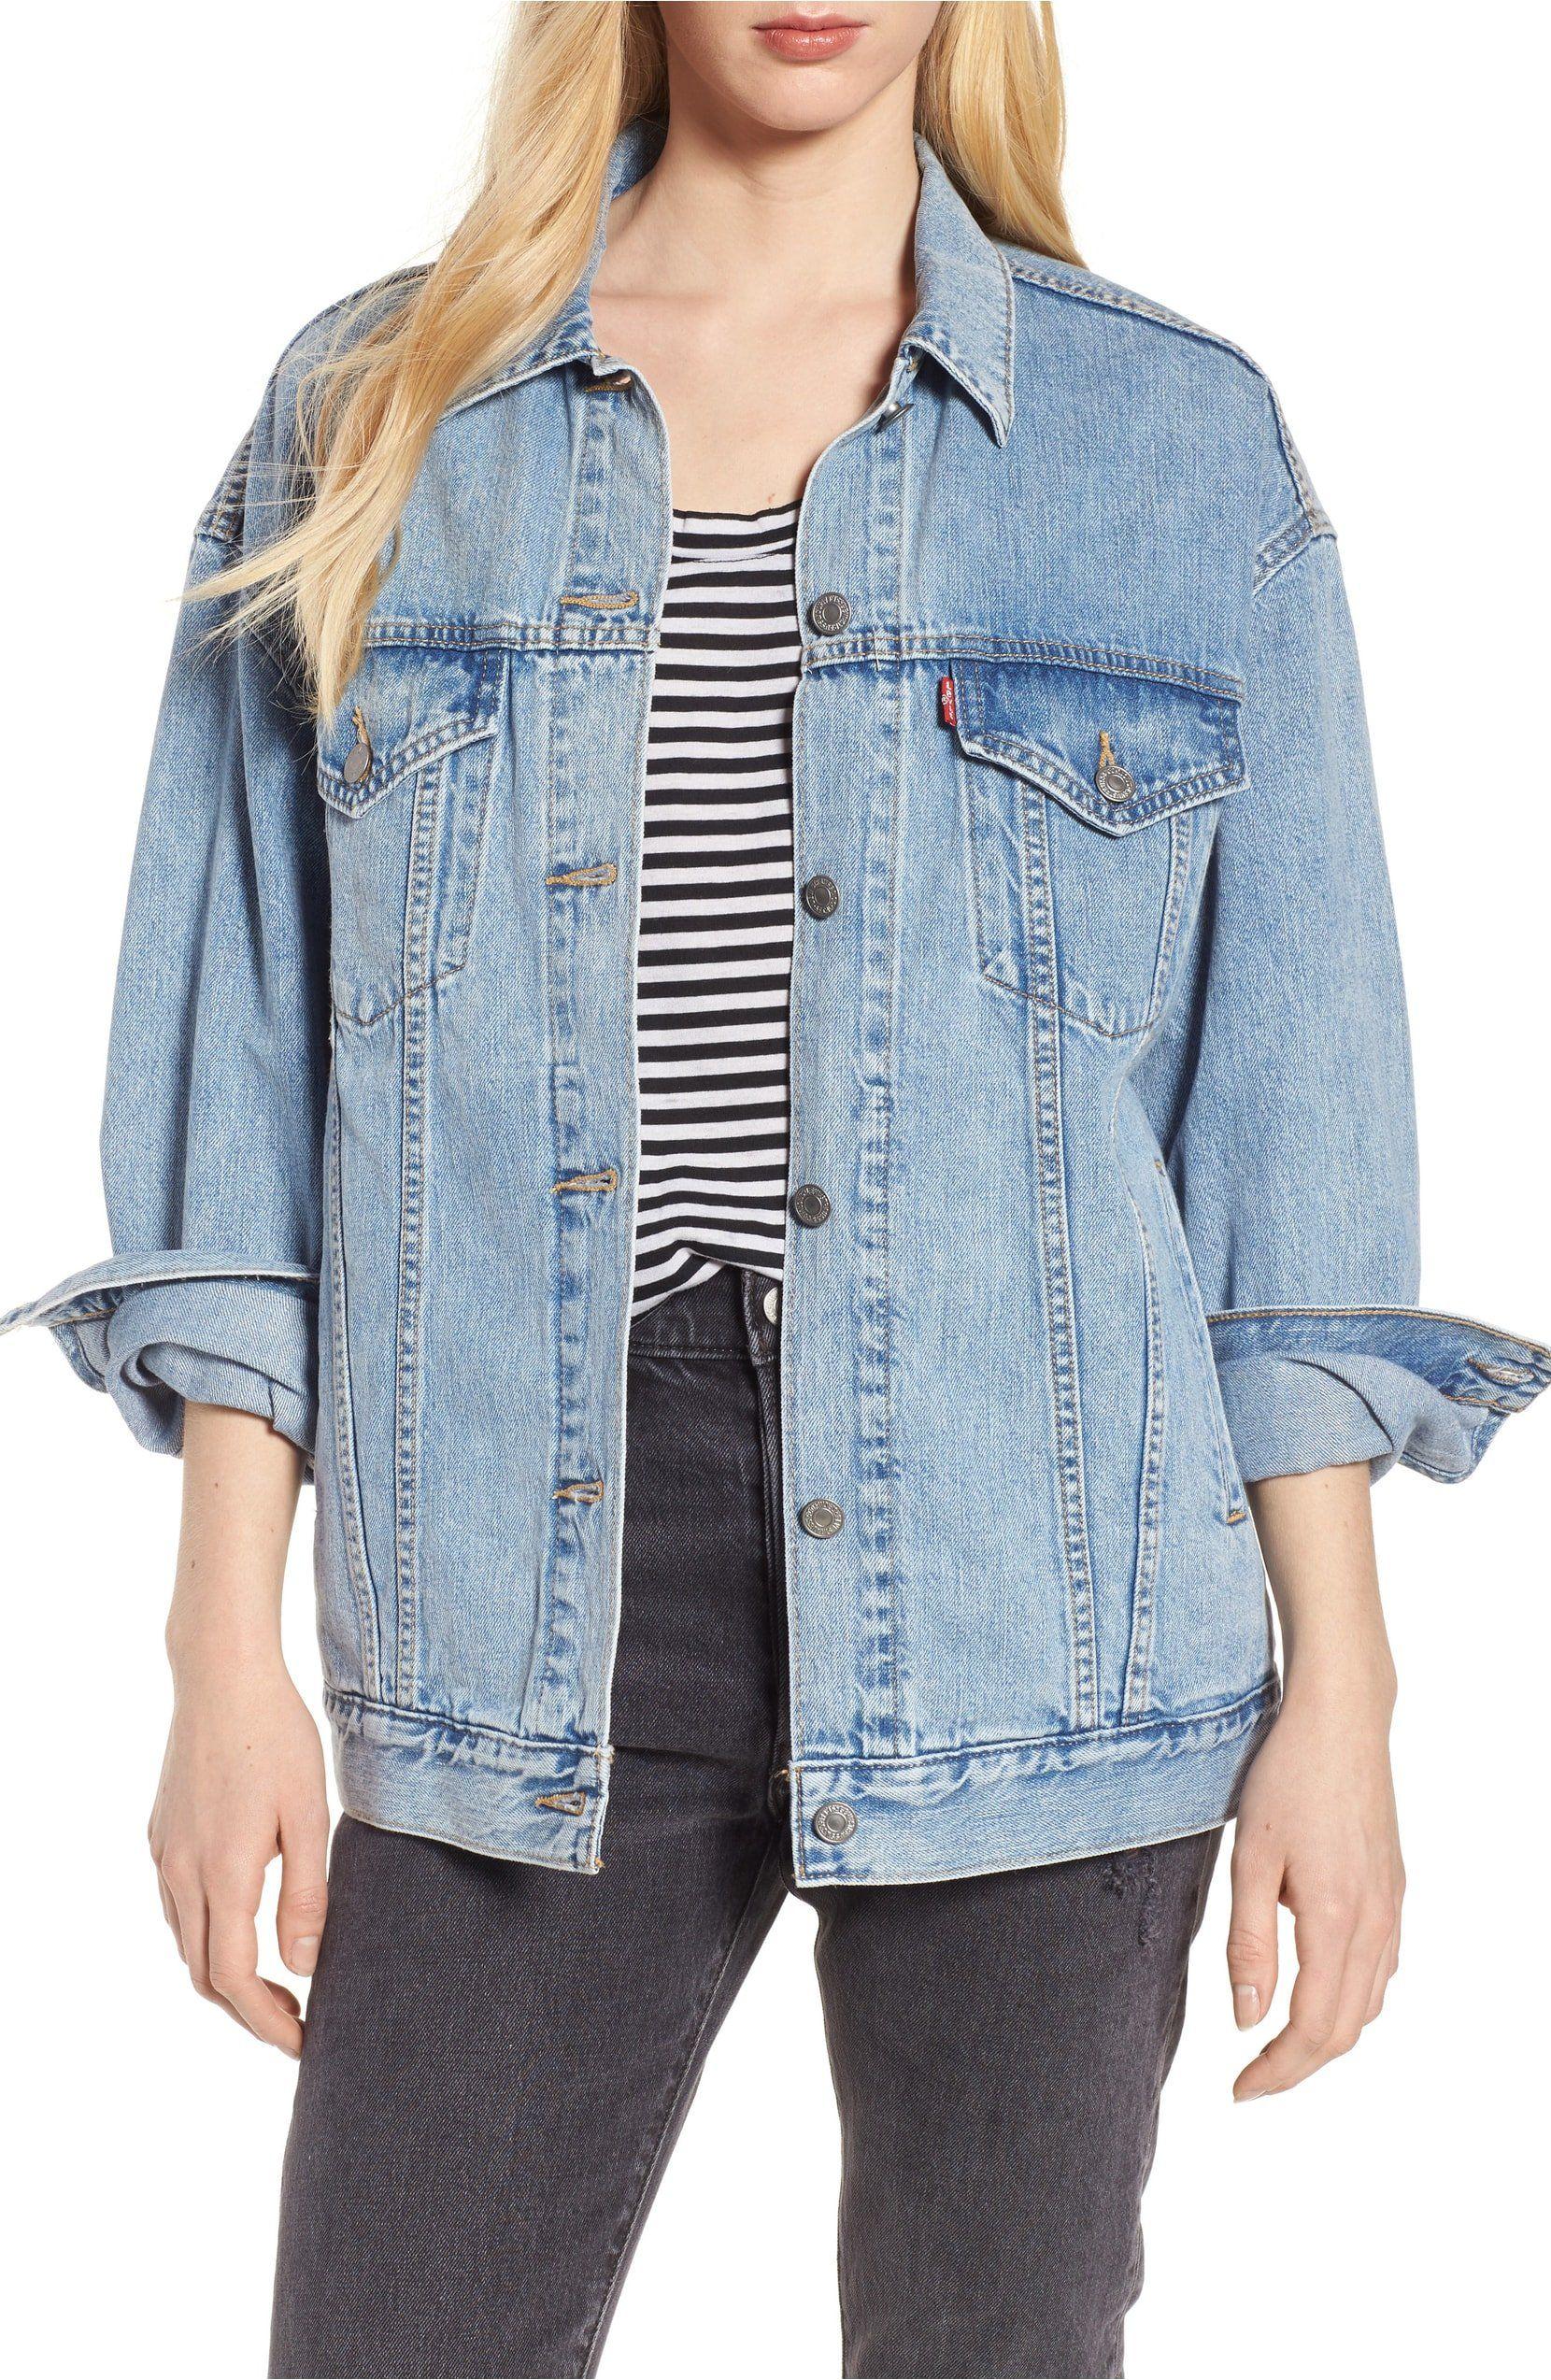 I Finally Found A Comfortable Denim Jacket That Isn T Stiff And It S Less Than 100 Denim Jacket Denim Jacket Women Jackets [ 2547 x 1660 Pixel ]